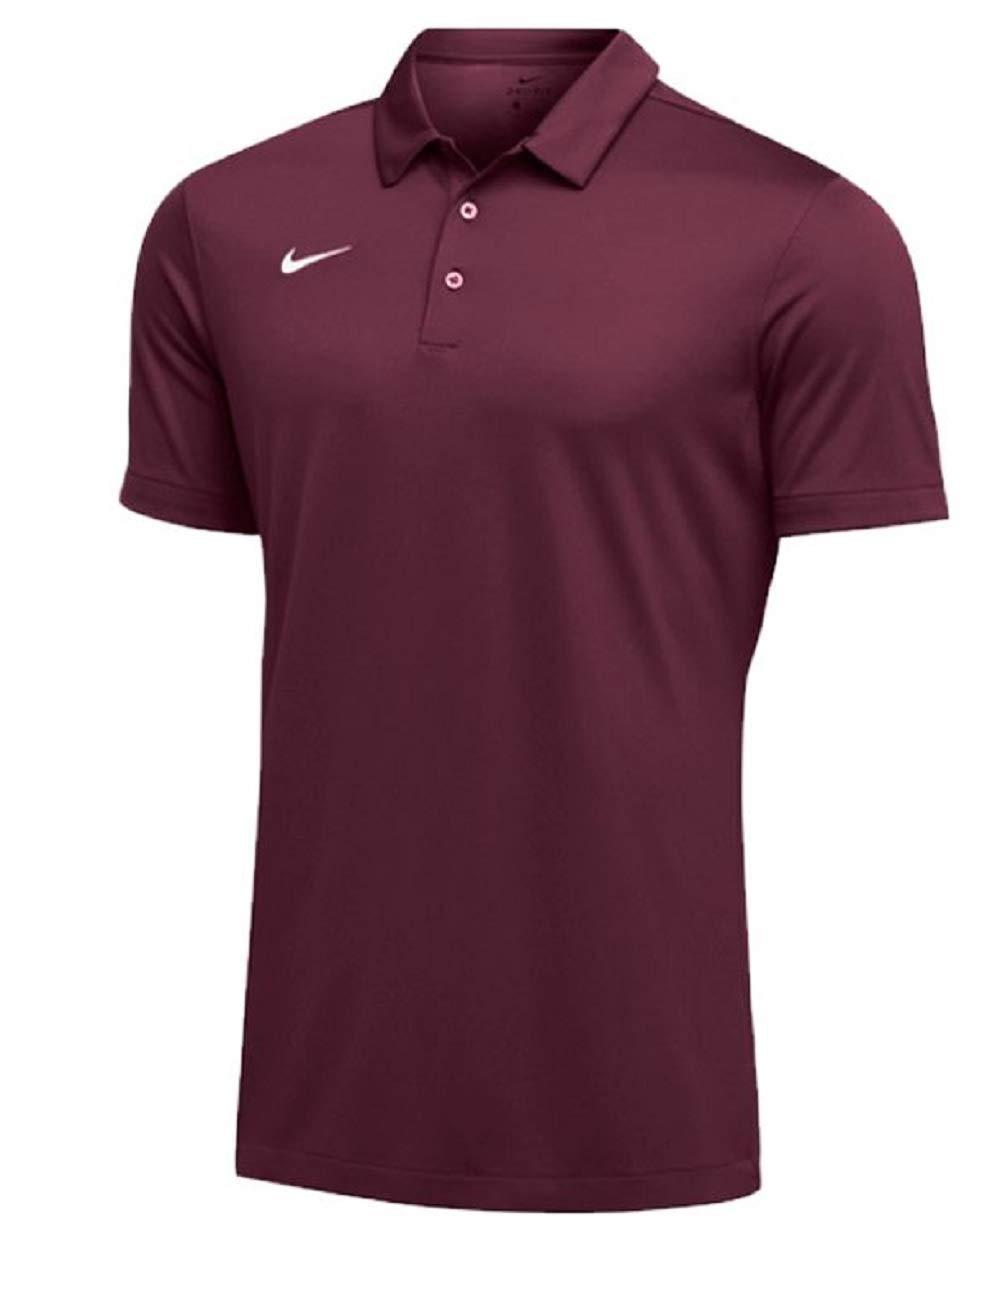 Nike Mens Dri-FIT Short Sleeve Polo Shirt (Medium, Maroon) by Nike (Image #2)